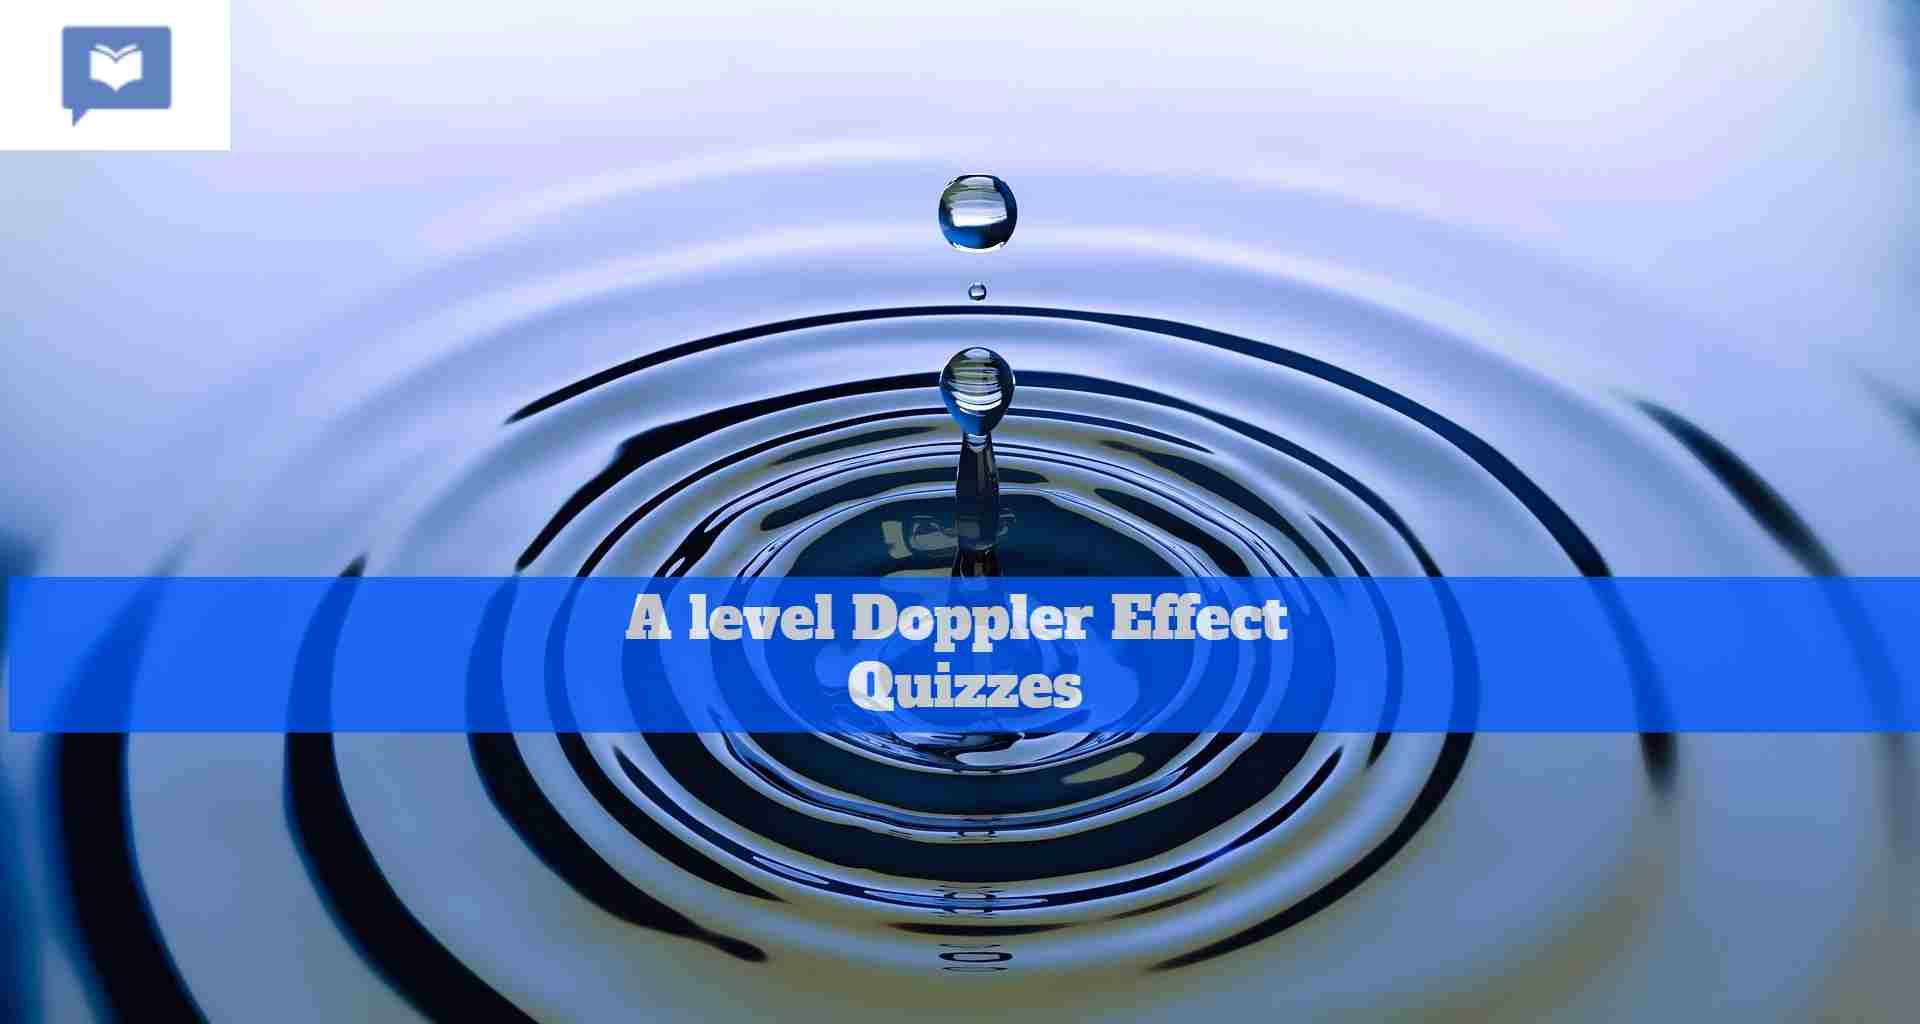 A level Doppler Effect Quizzes